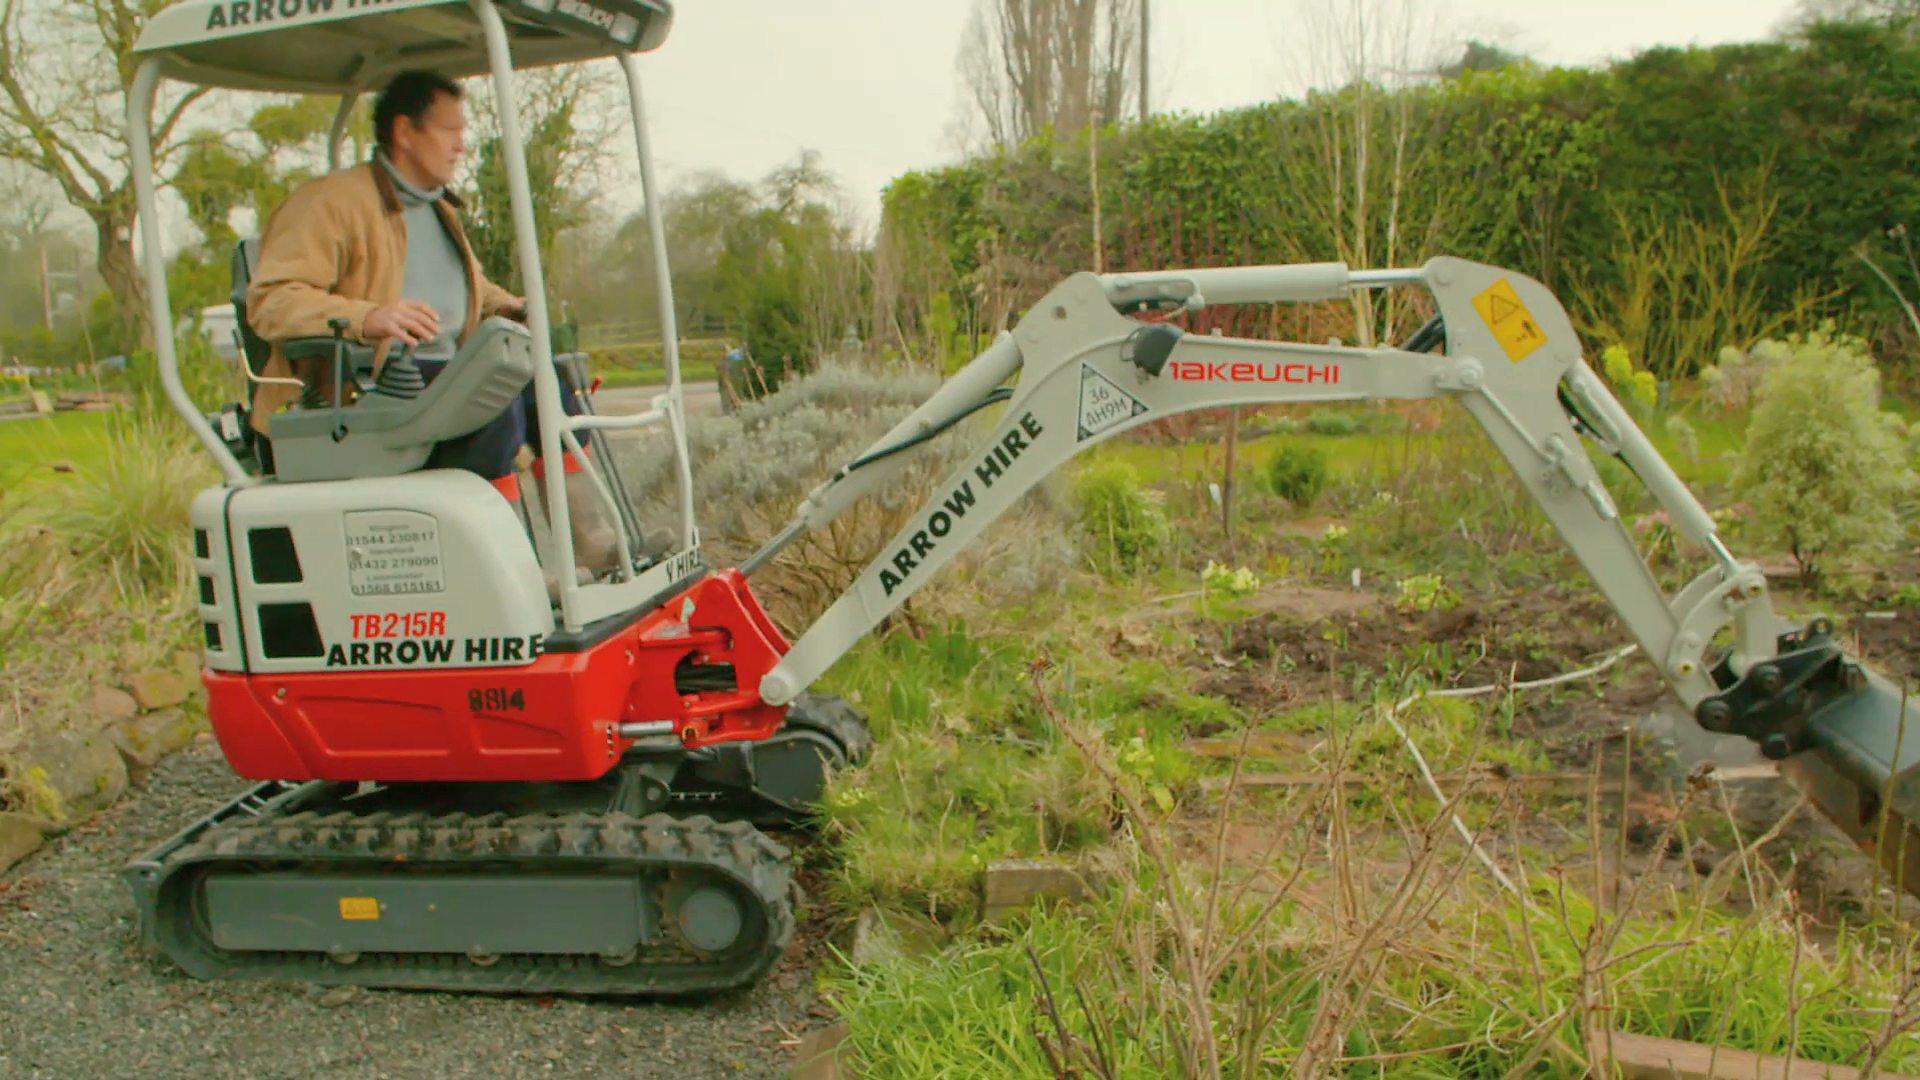 BBC Two - Big Dreams Small Spaces, Series 2, Episode 2